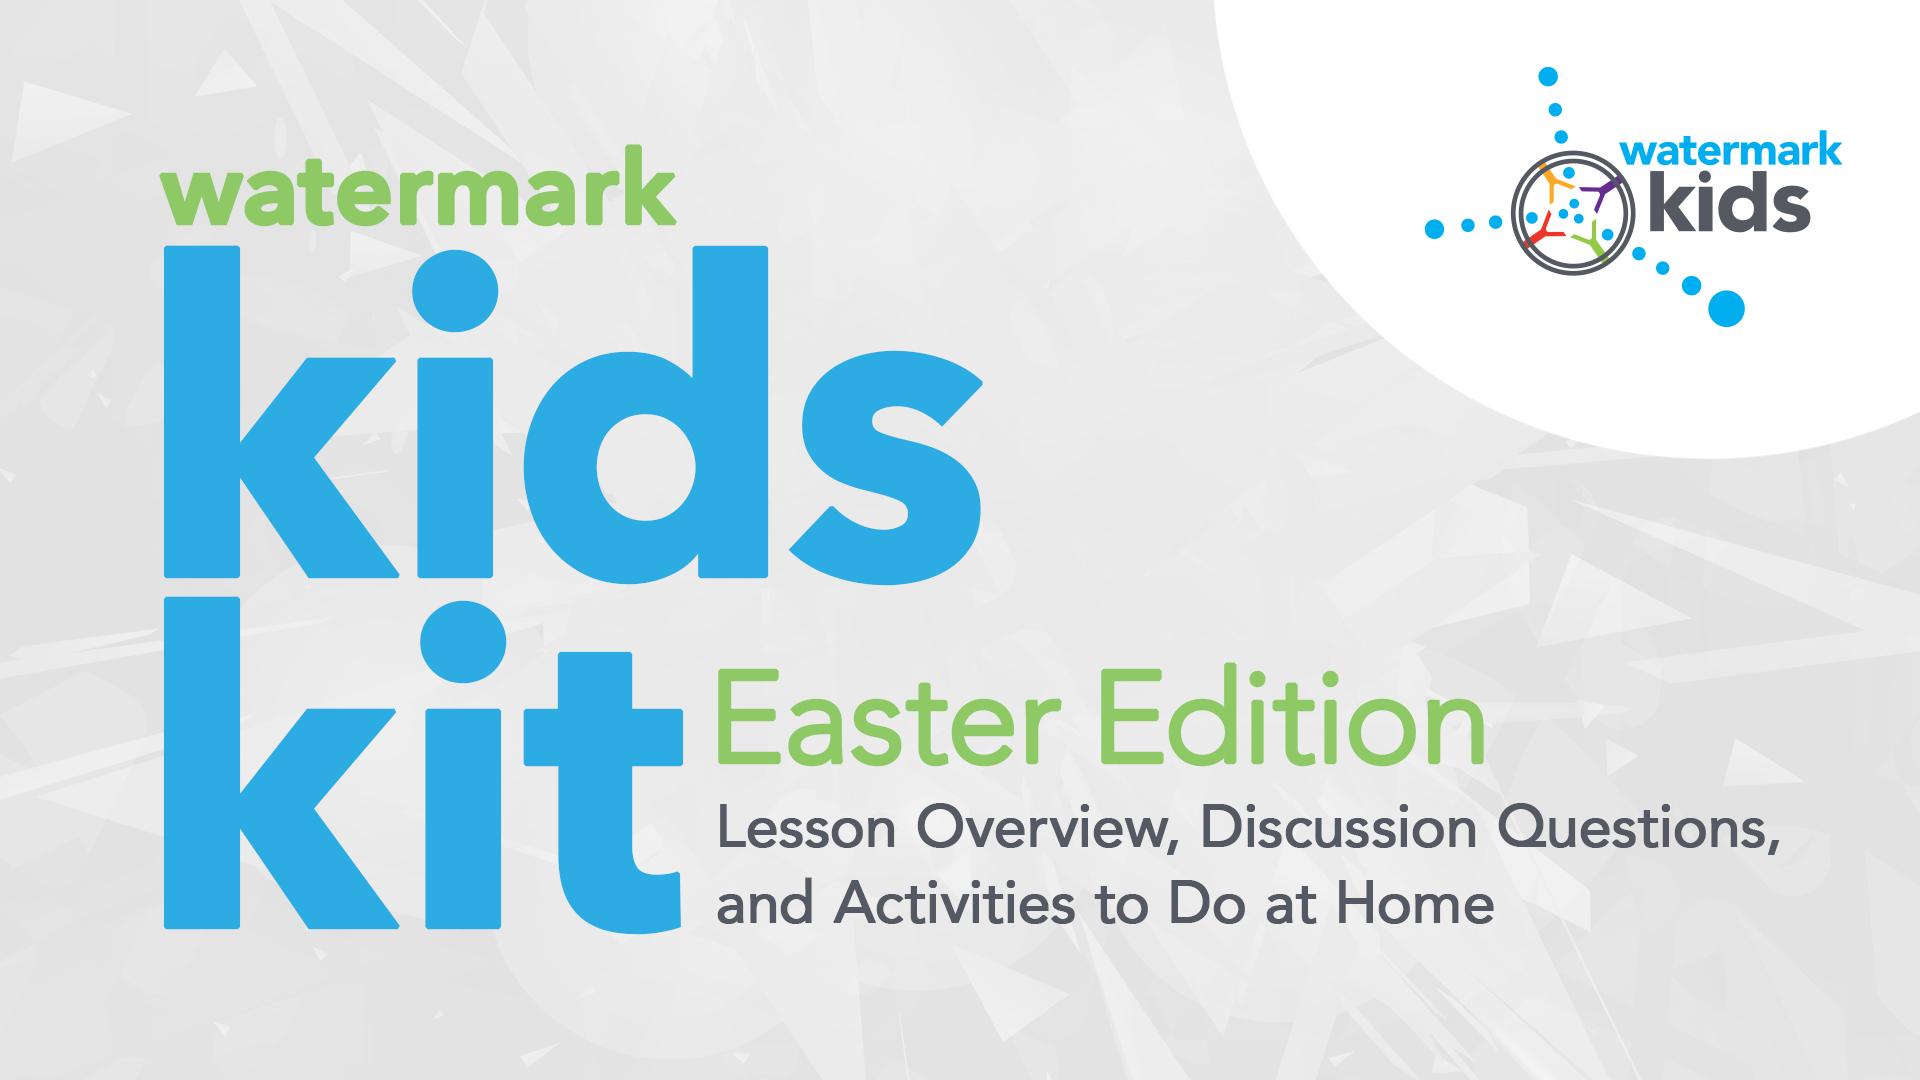 Watermark Kids Kit: Easter Edition Hero Image